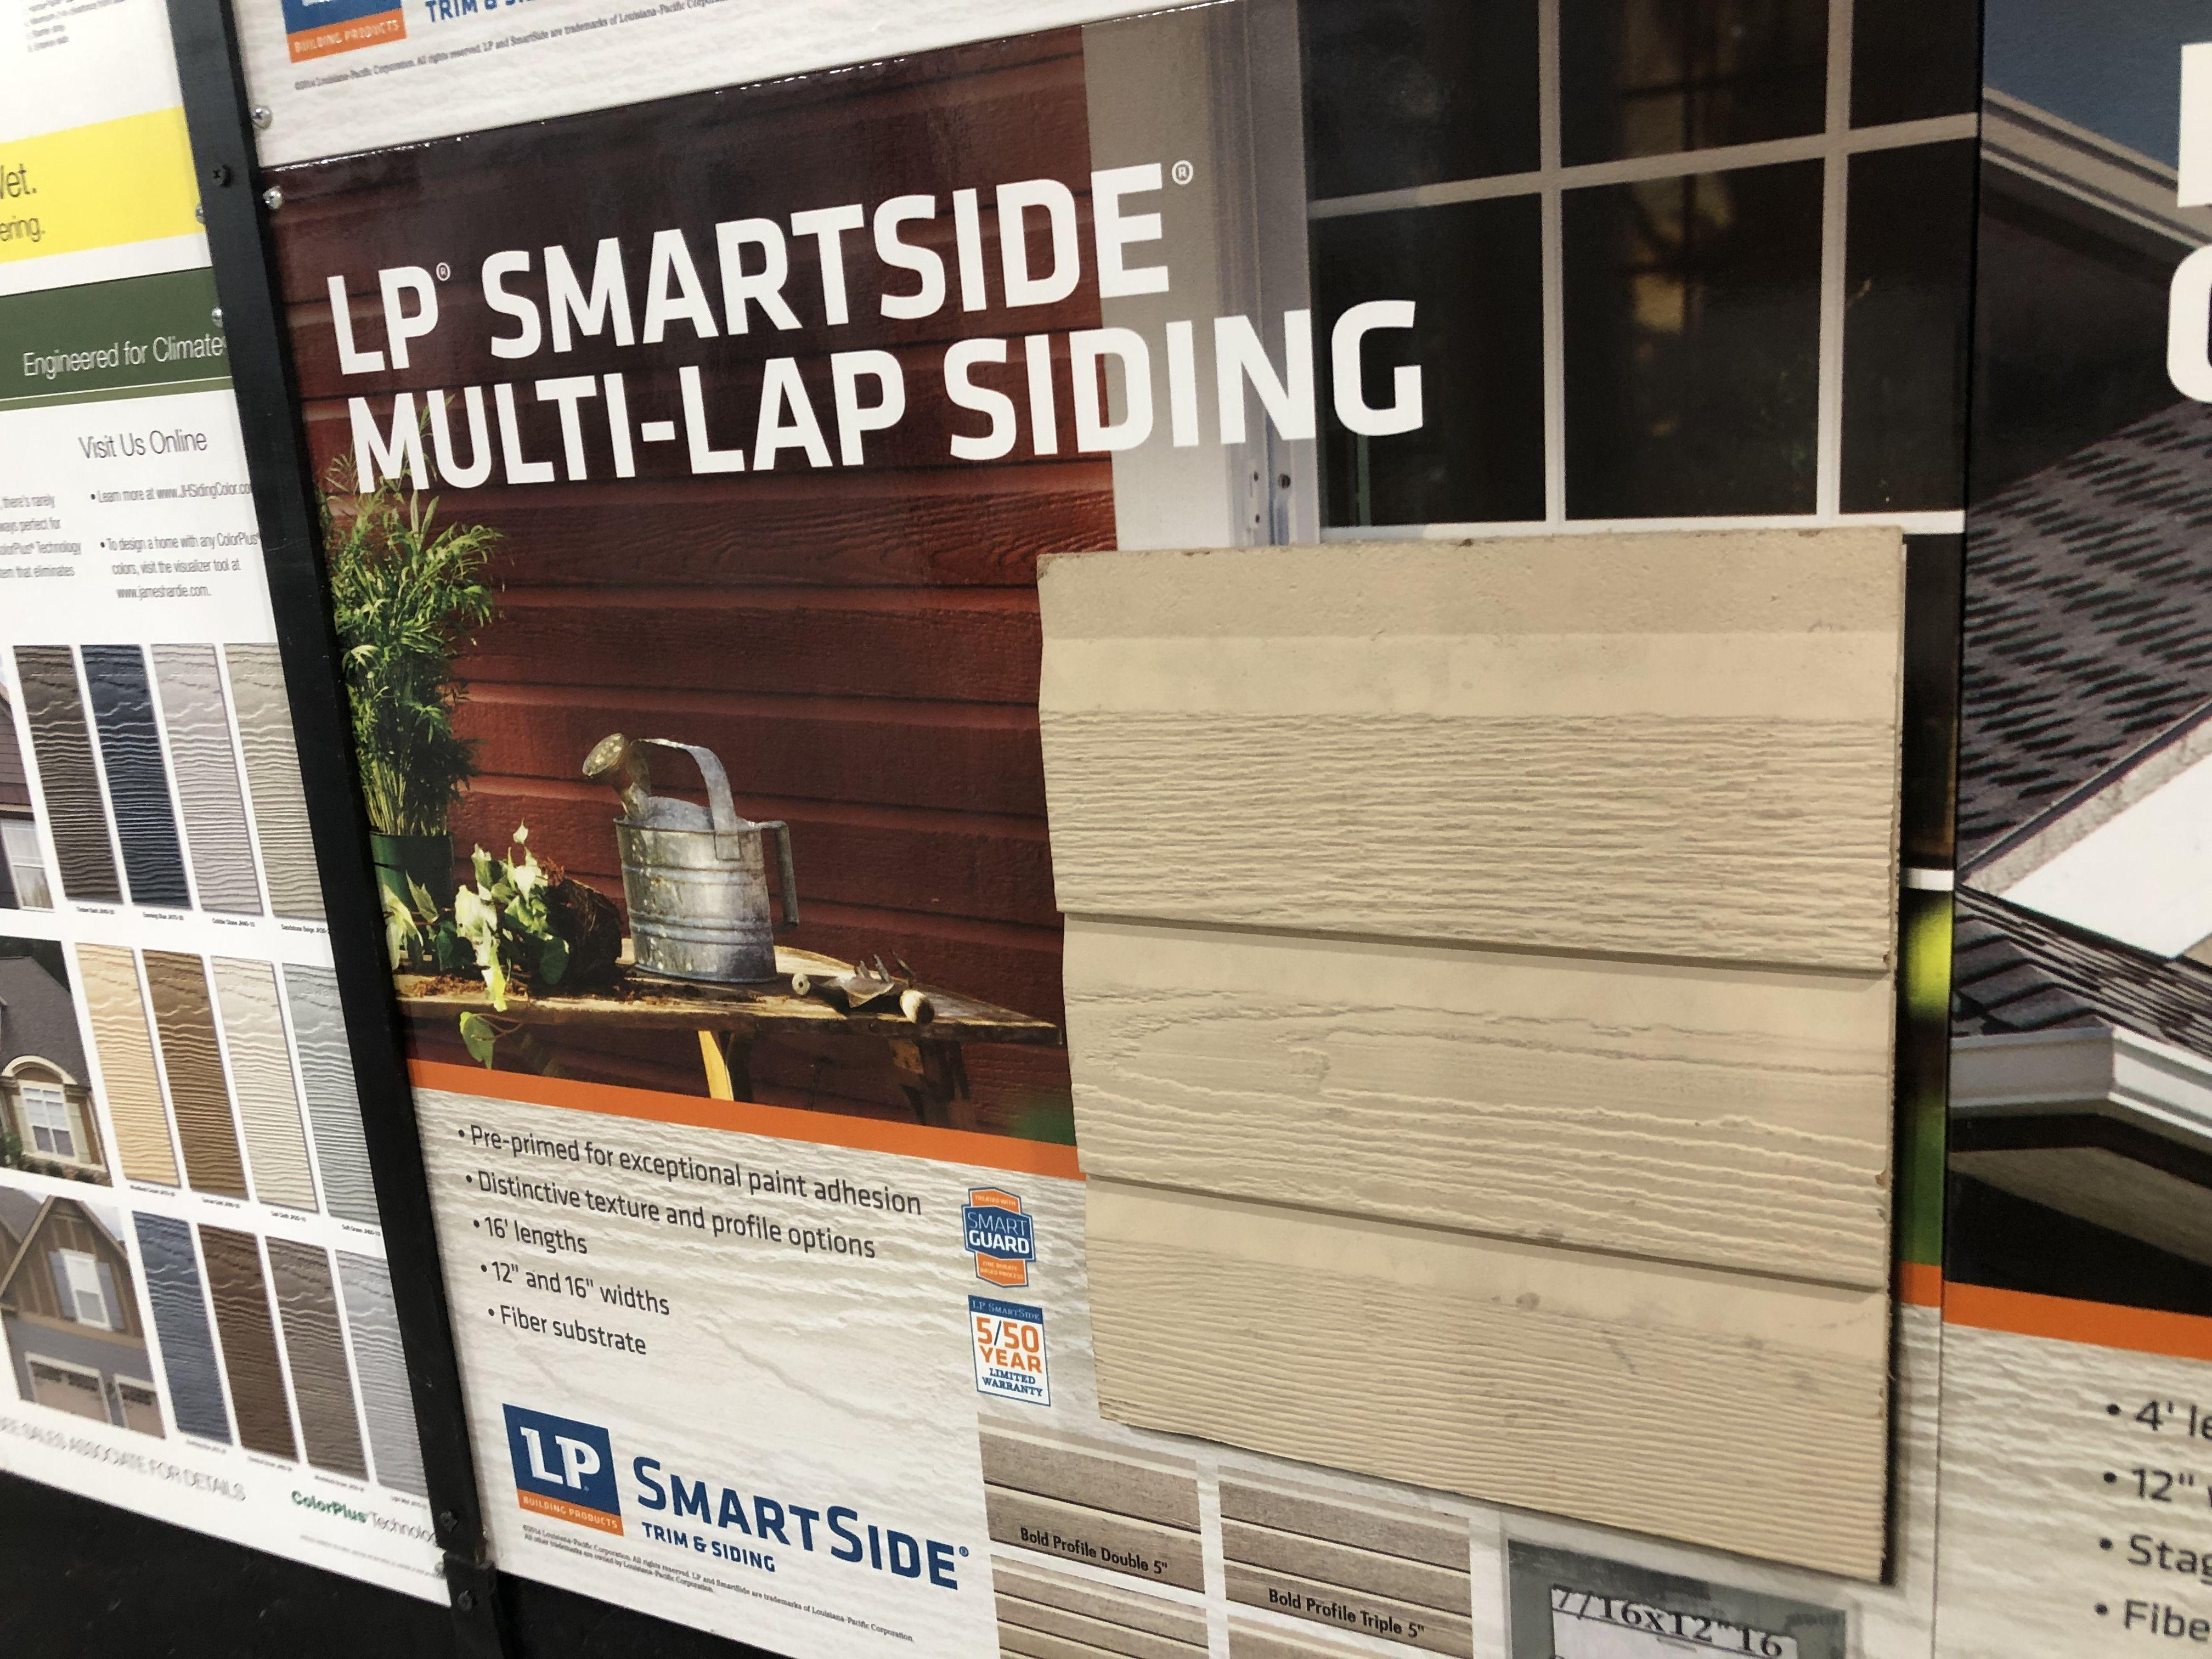 Lp Smart Siding 12 Triple Multi Lap Panel Siding Solar Panel Installation Polycarbonate Roof Panels